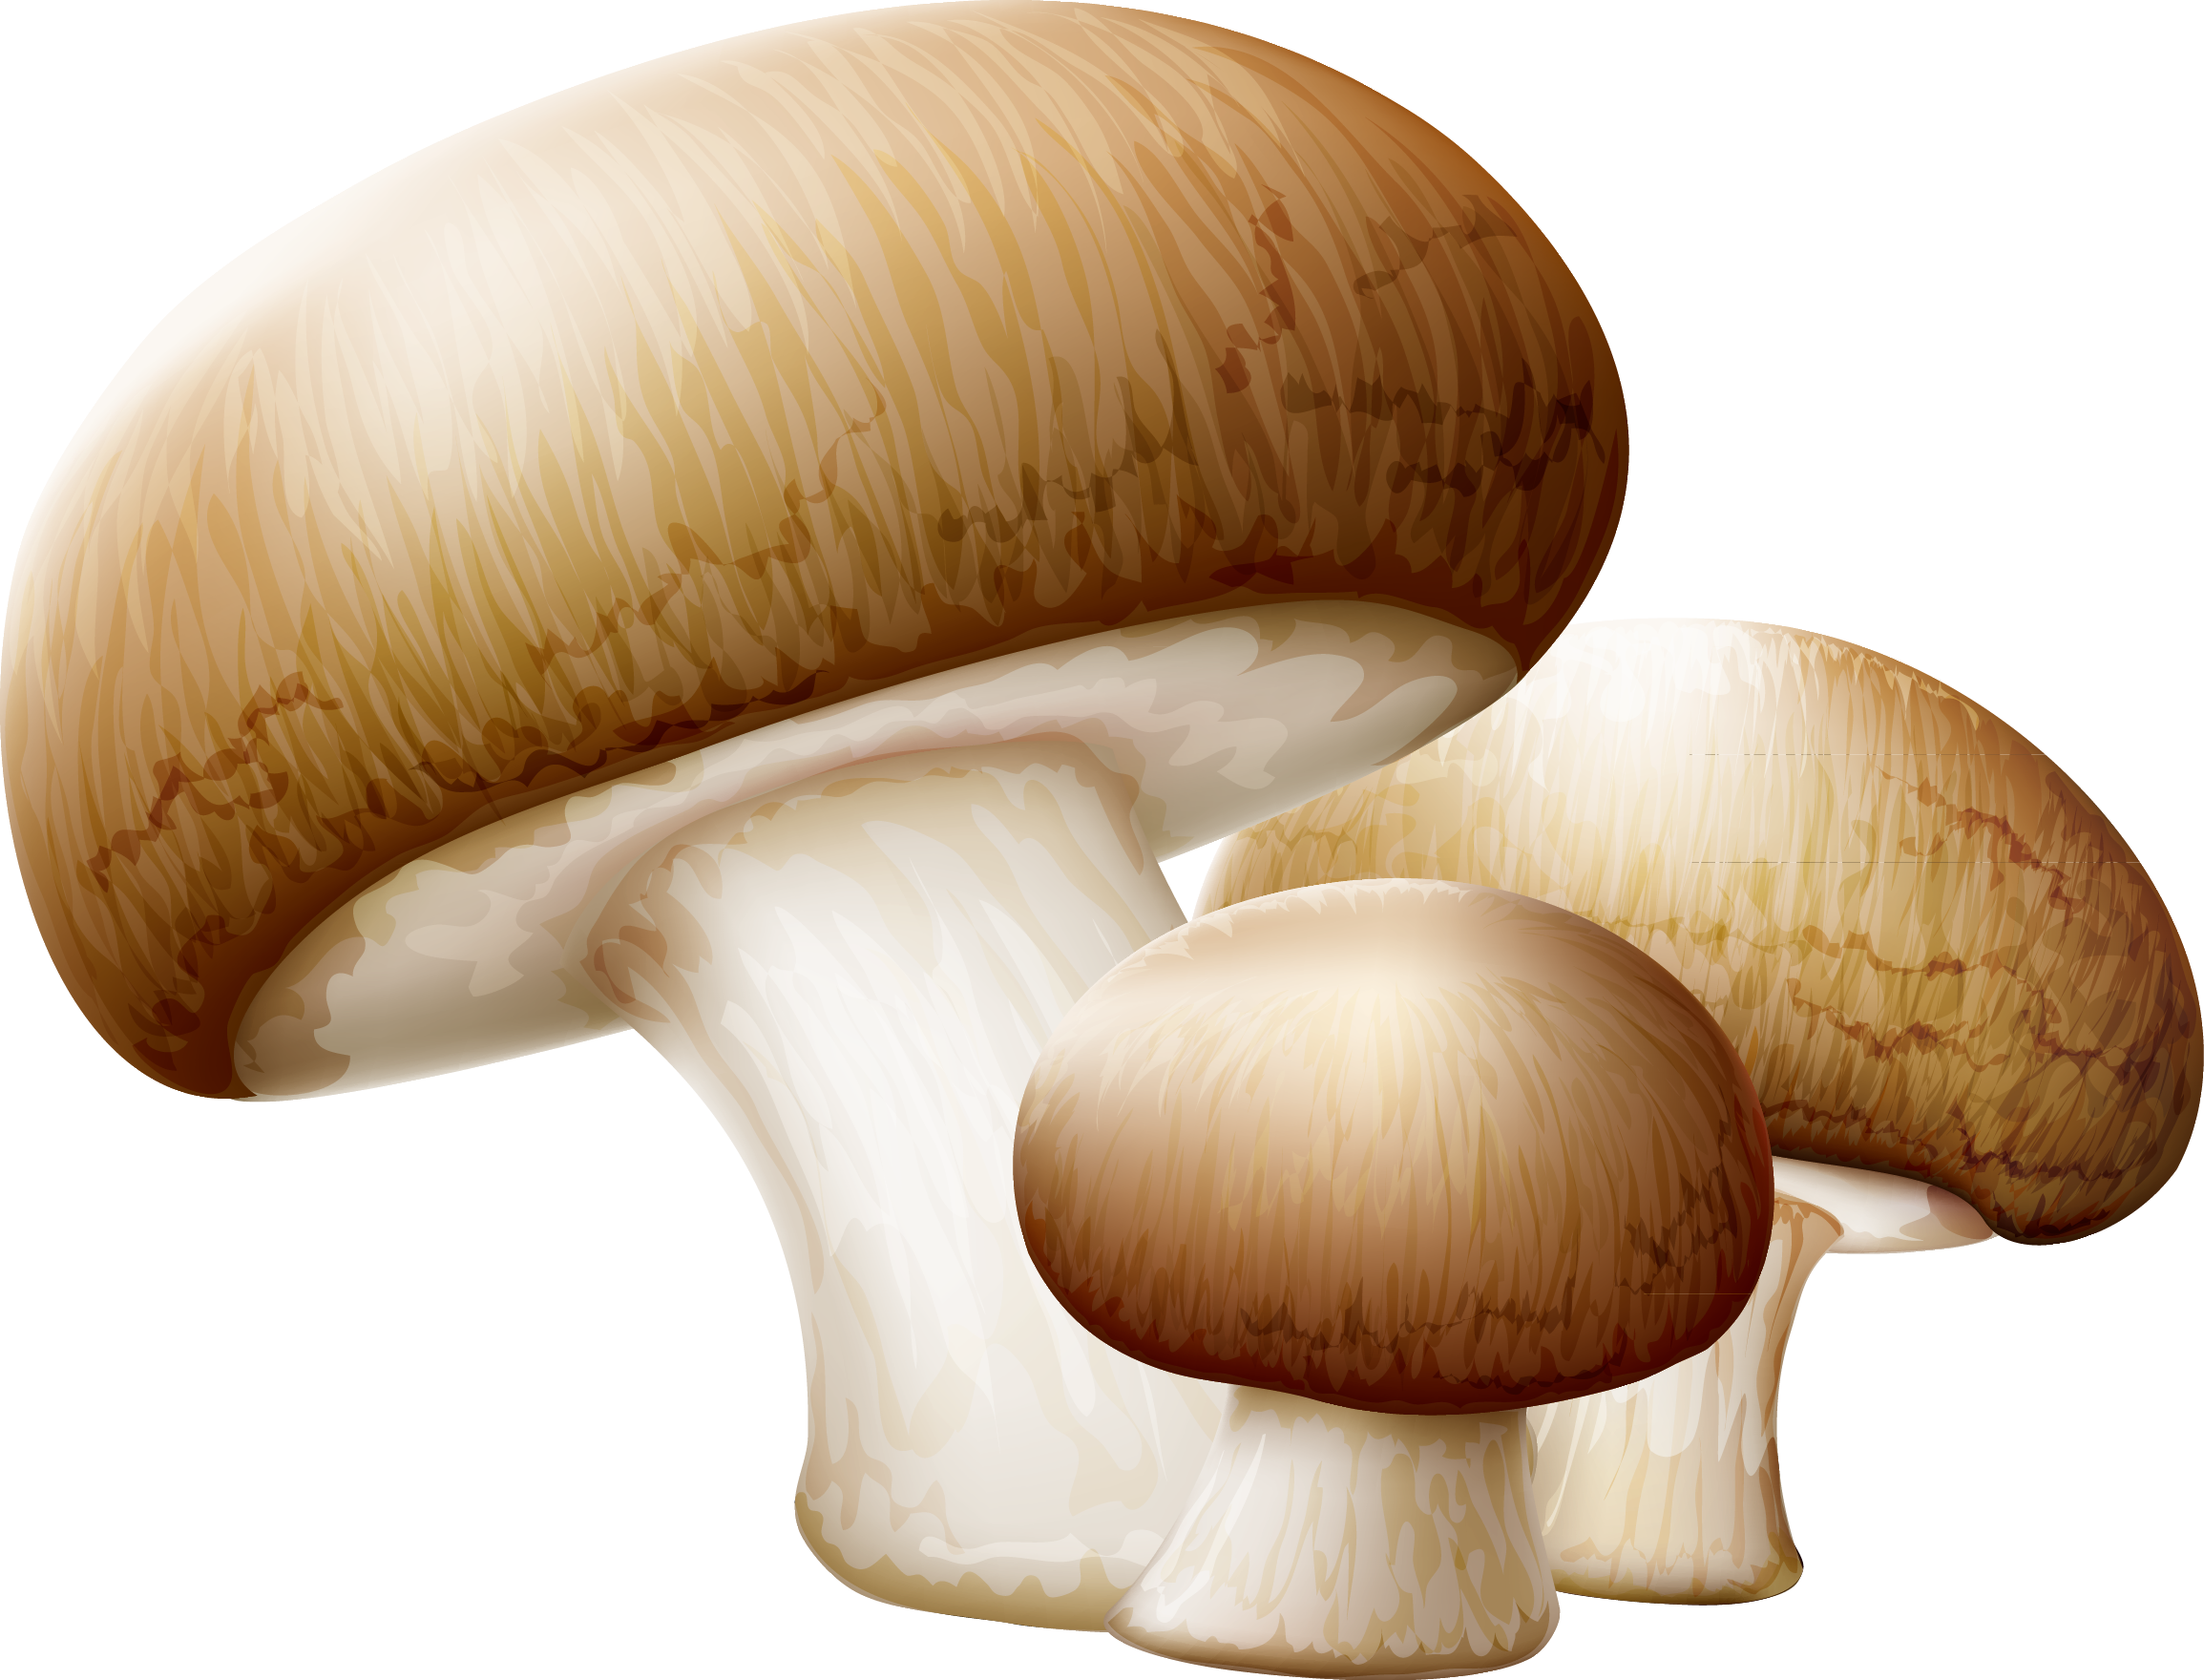 clipart royalty free Common edible clip art. Mushrooms clipart orange mushroom.